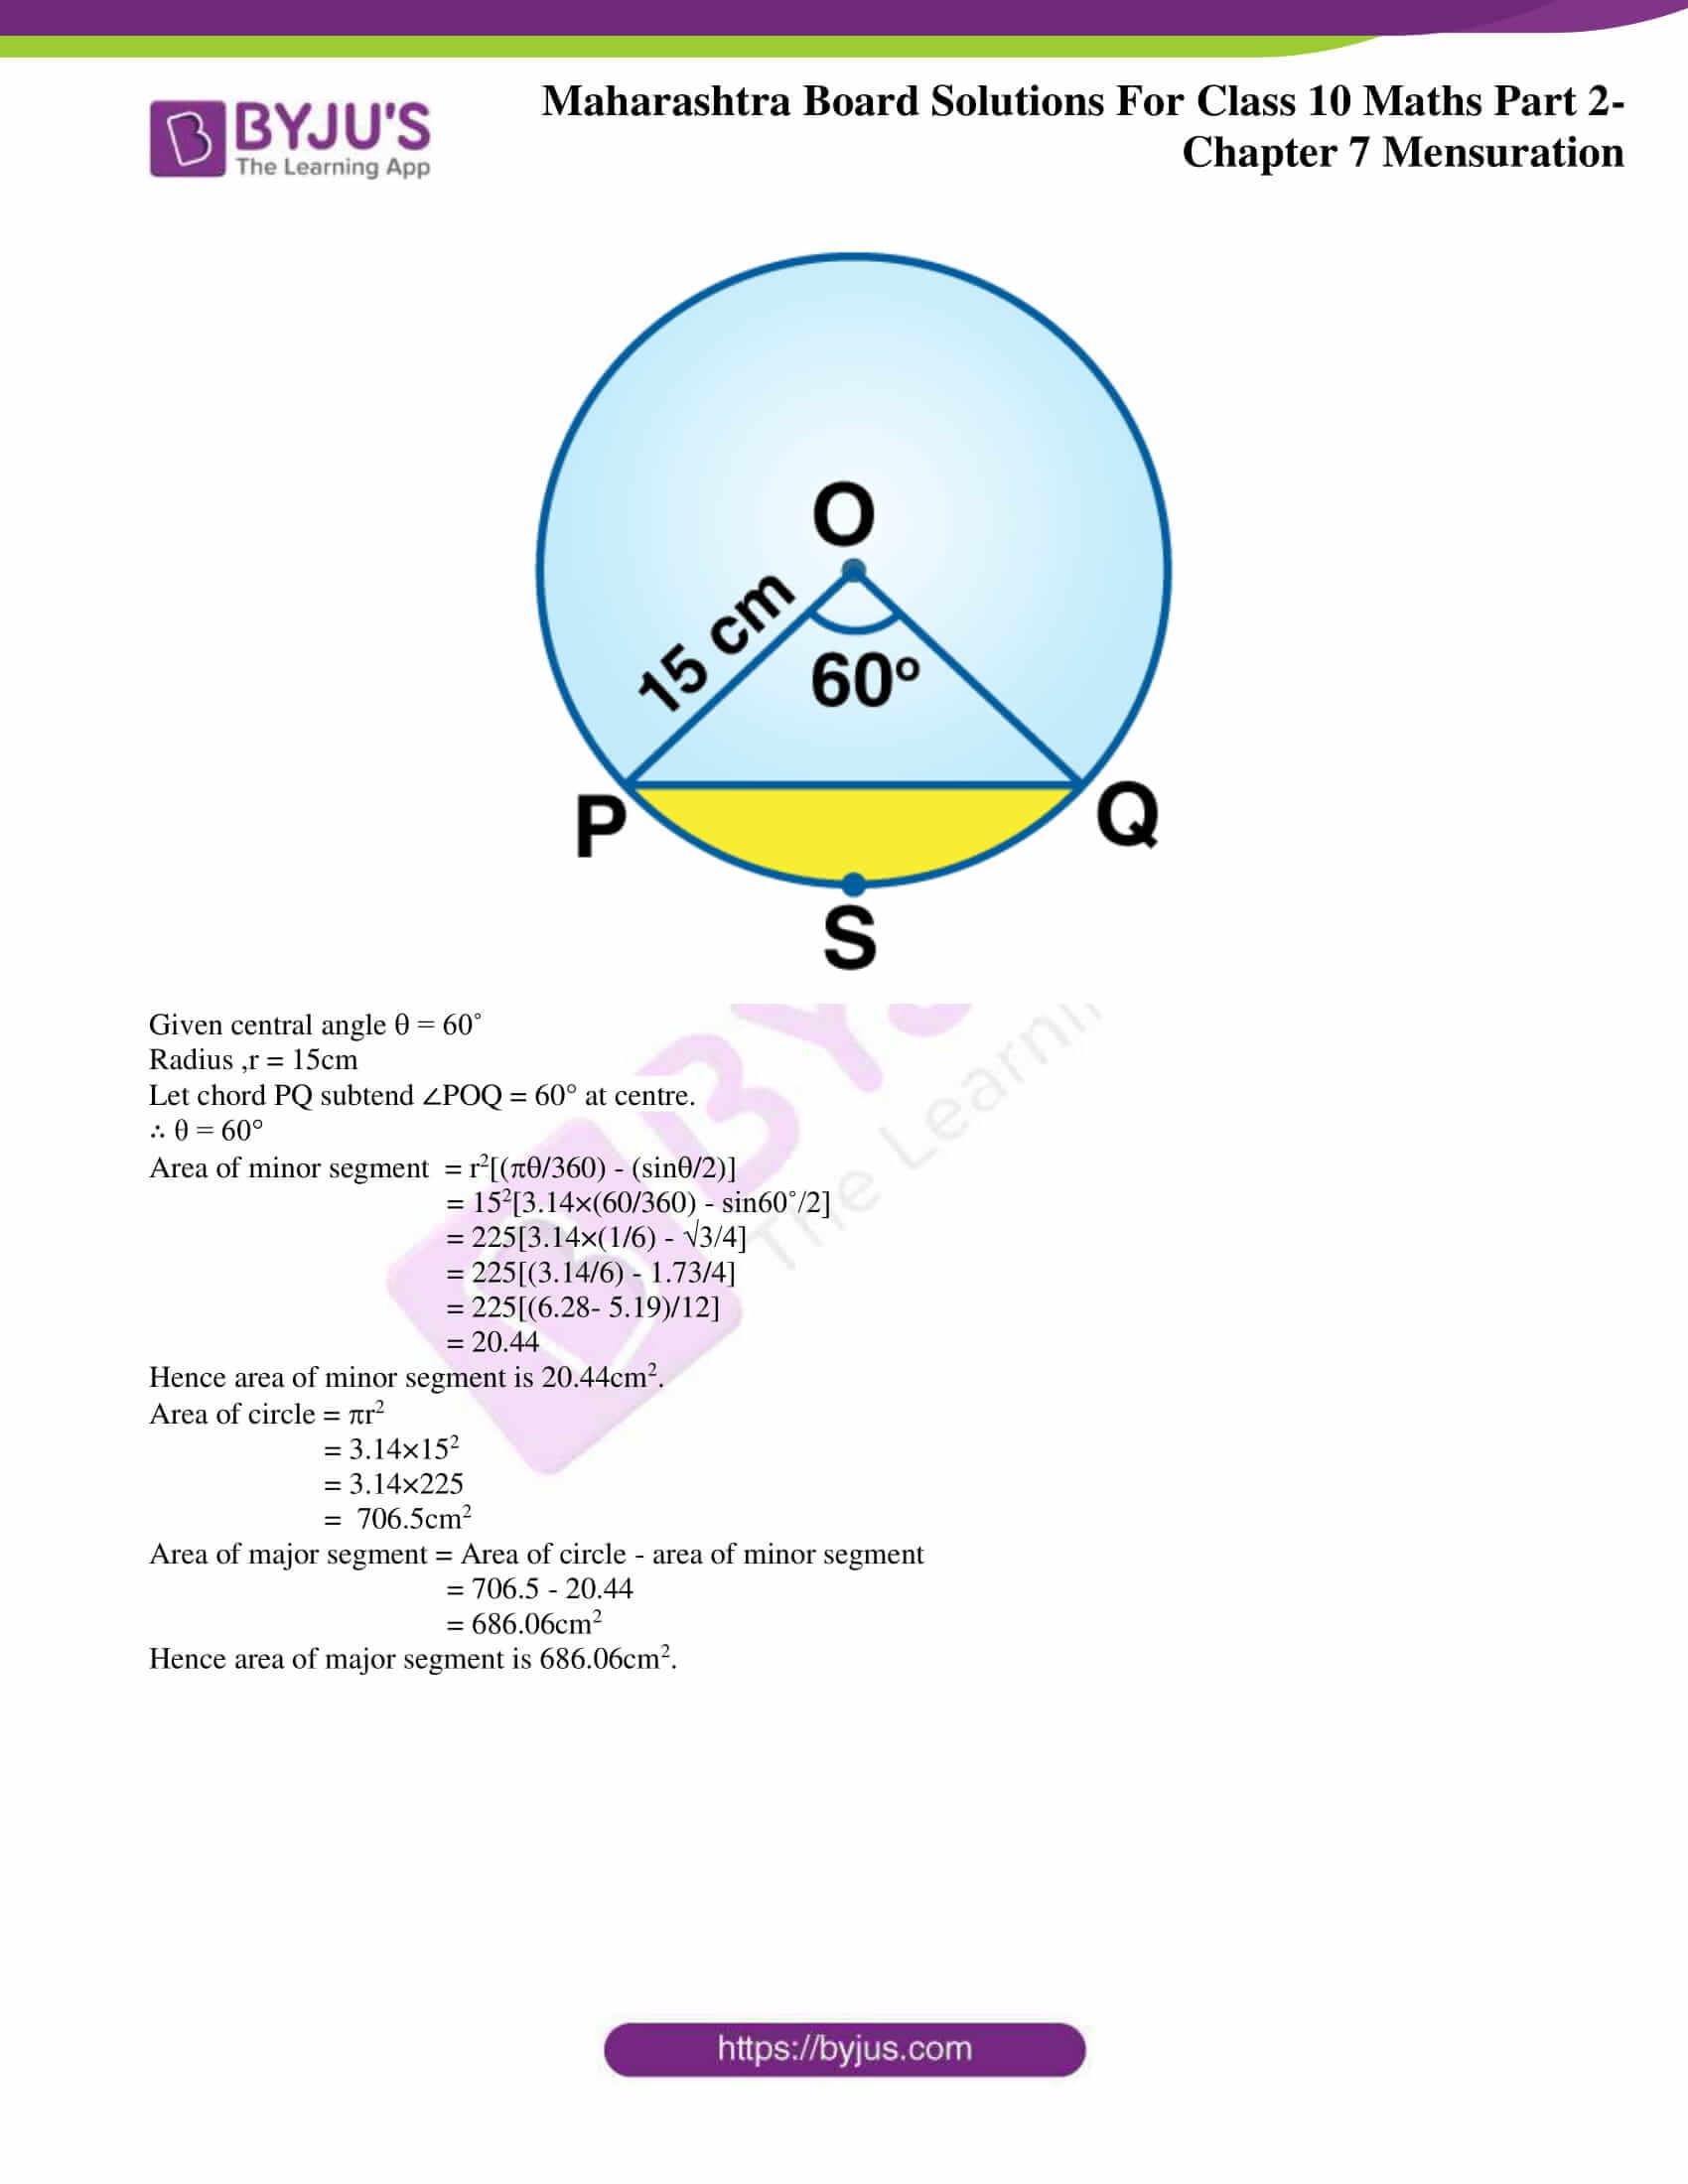 msbshse sol class 10 maths part 2 chapter 7 21